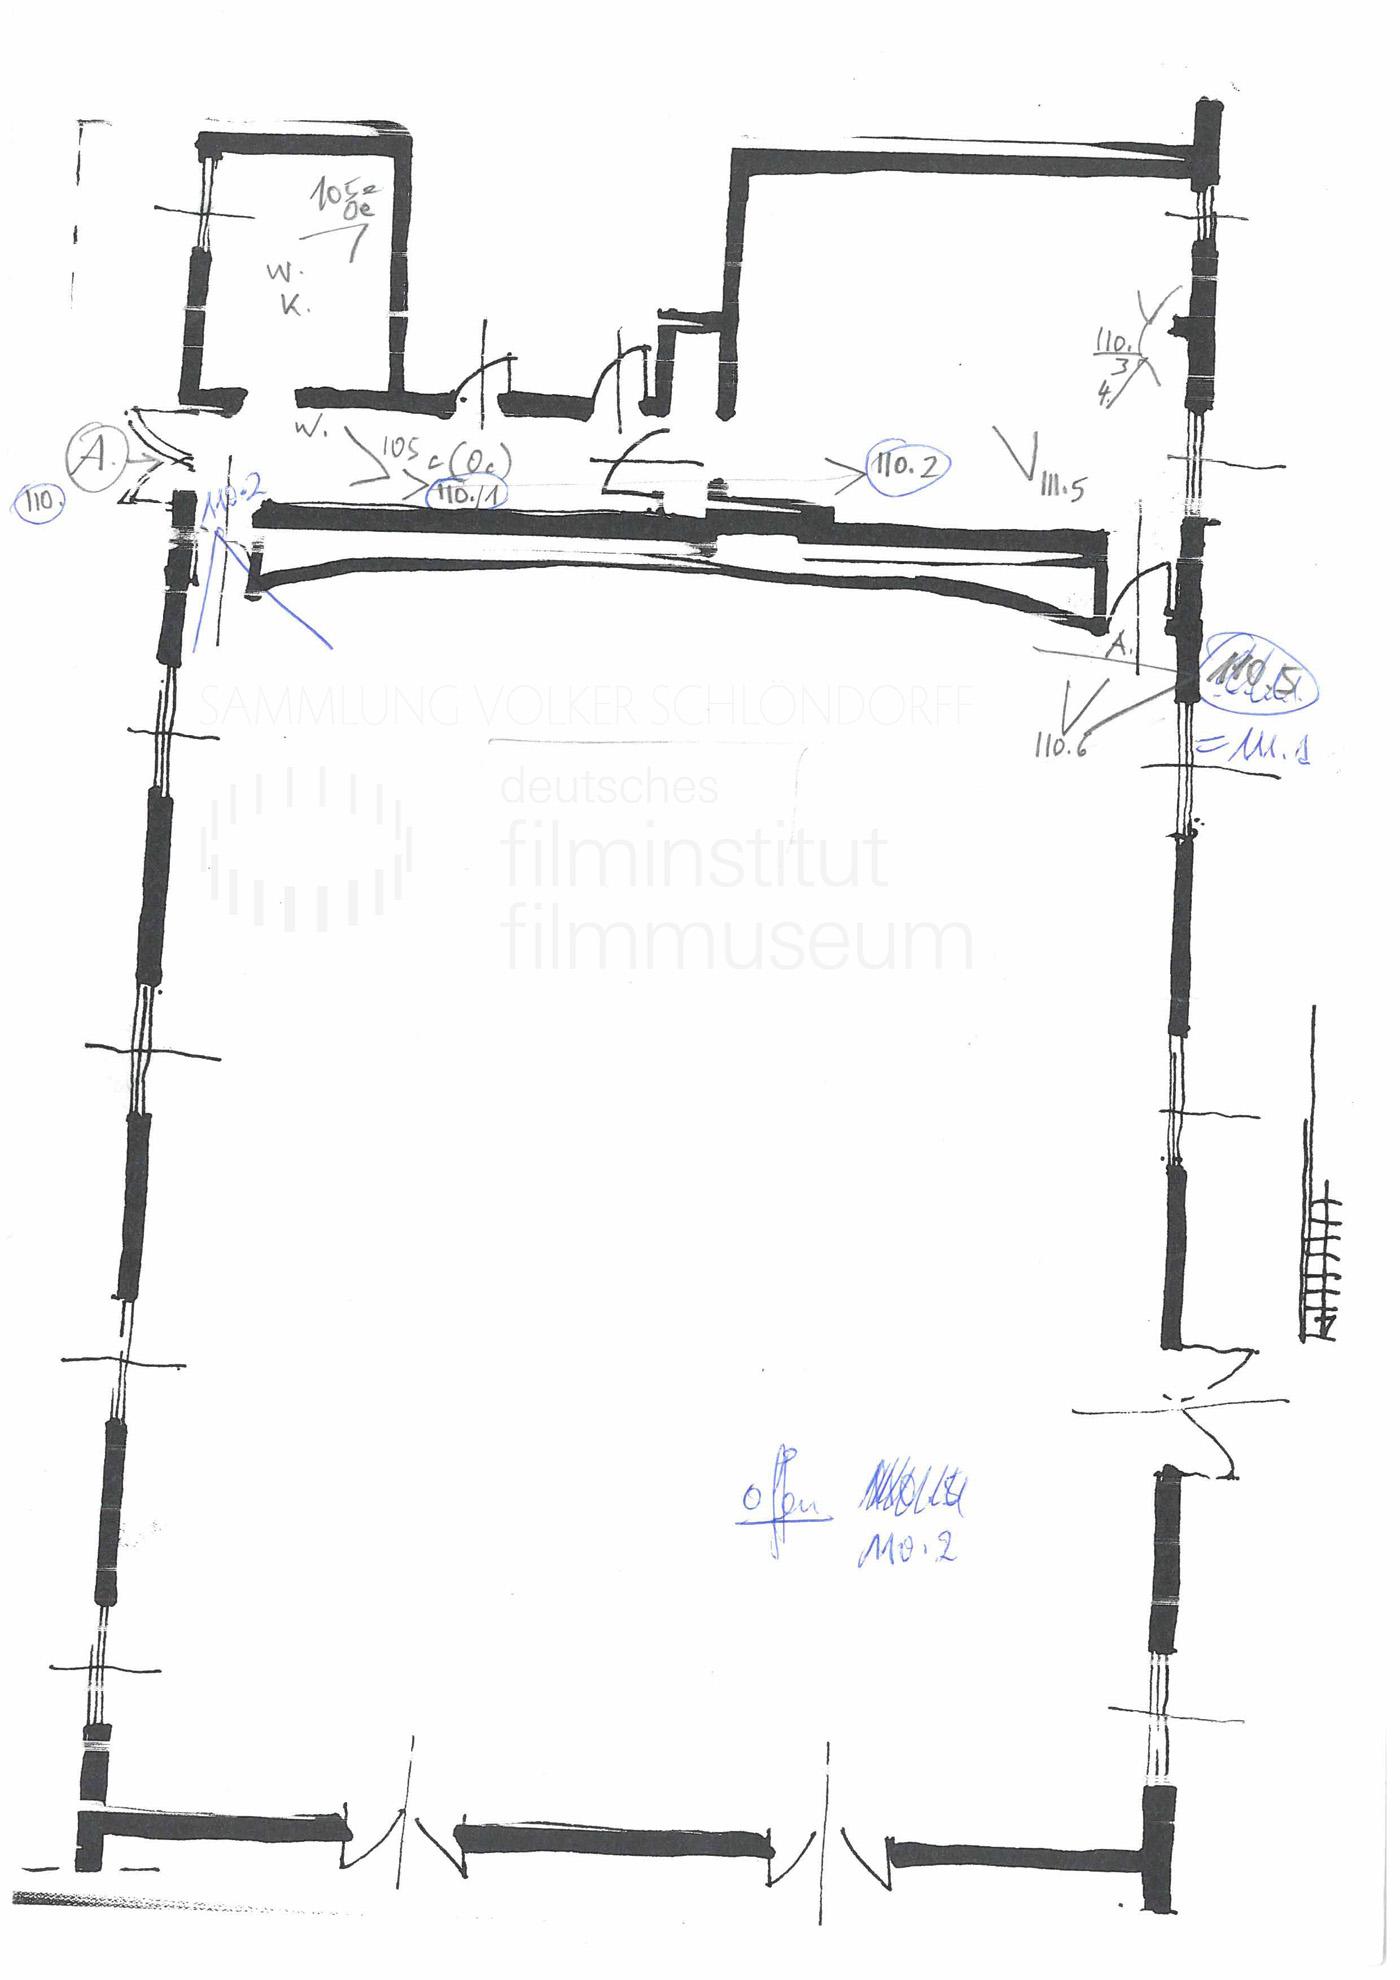 STRAJK // Produktionsmaterial / Skizze, 1e